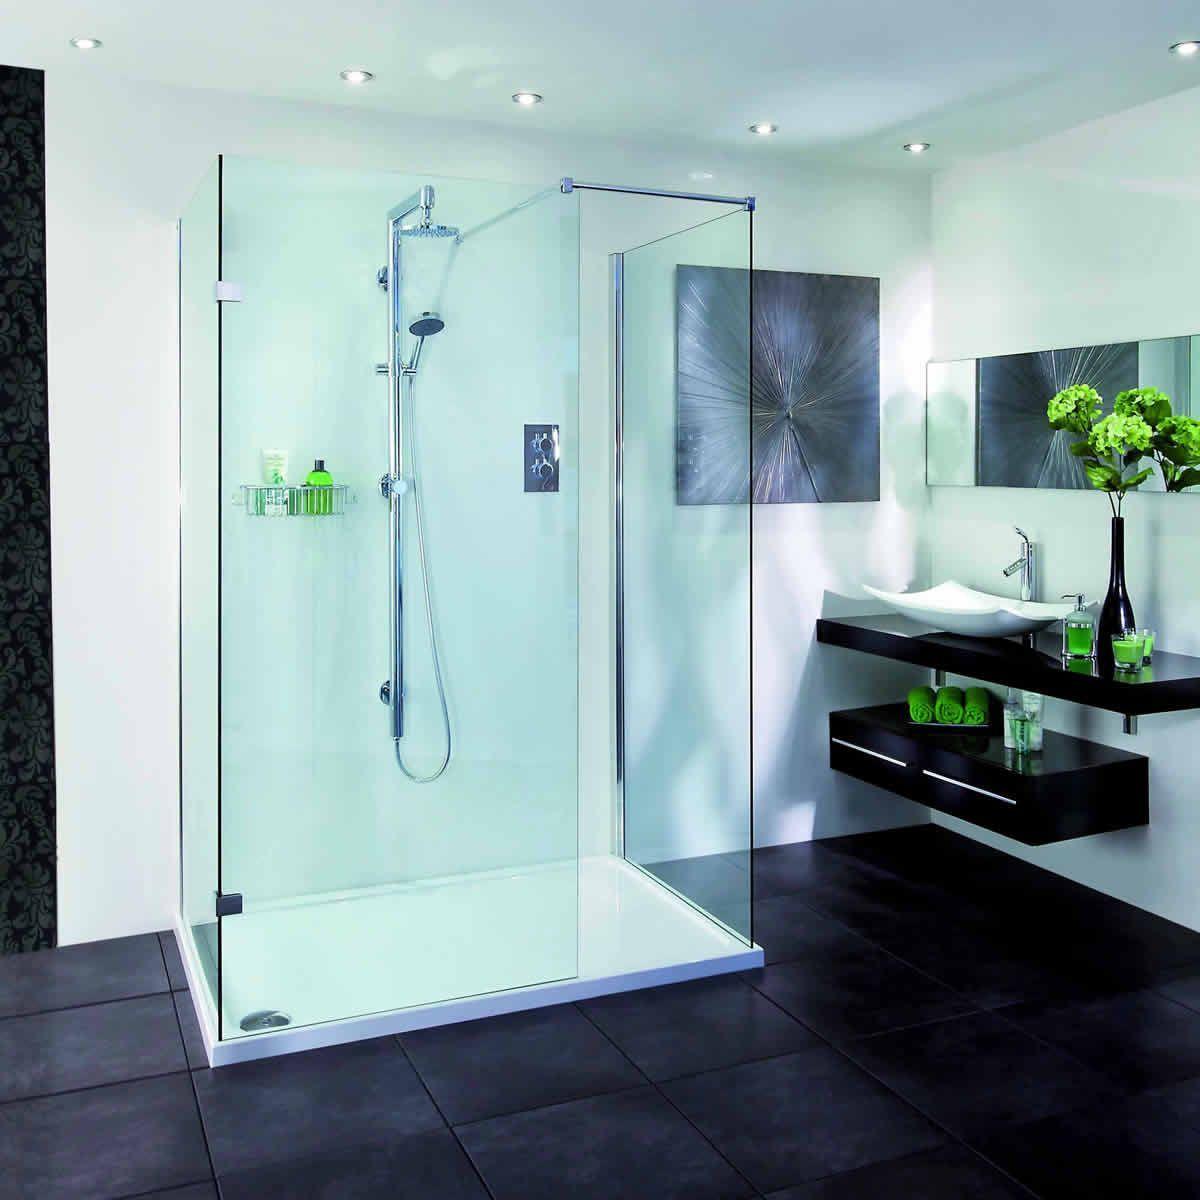 Aqata Spectra Walk-In 3 sided Shower Enclosure SP415 | Wet room ...